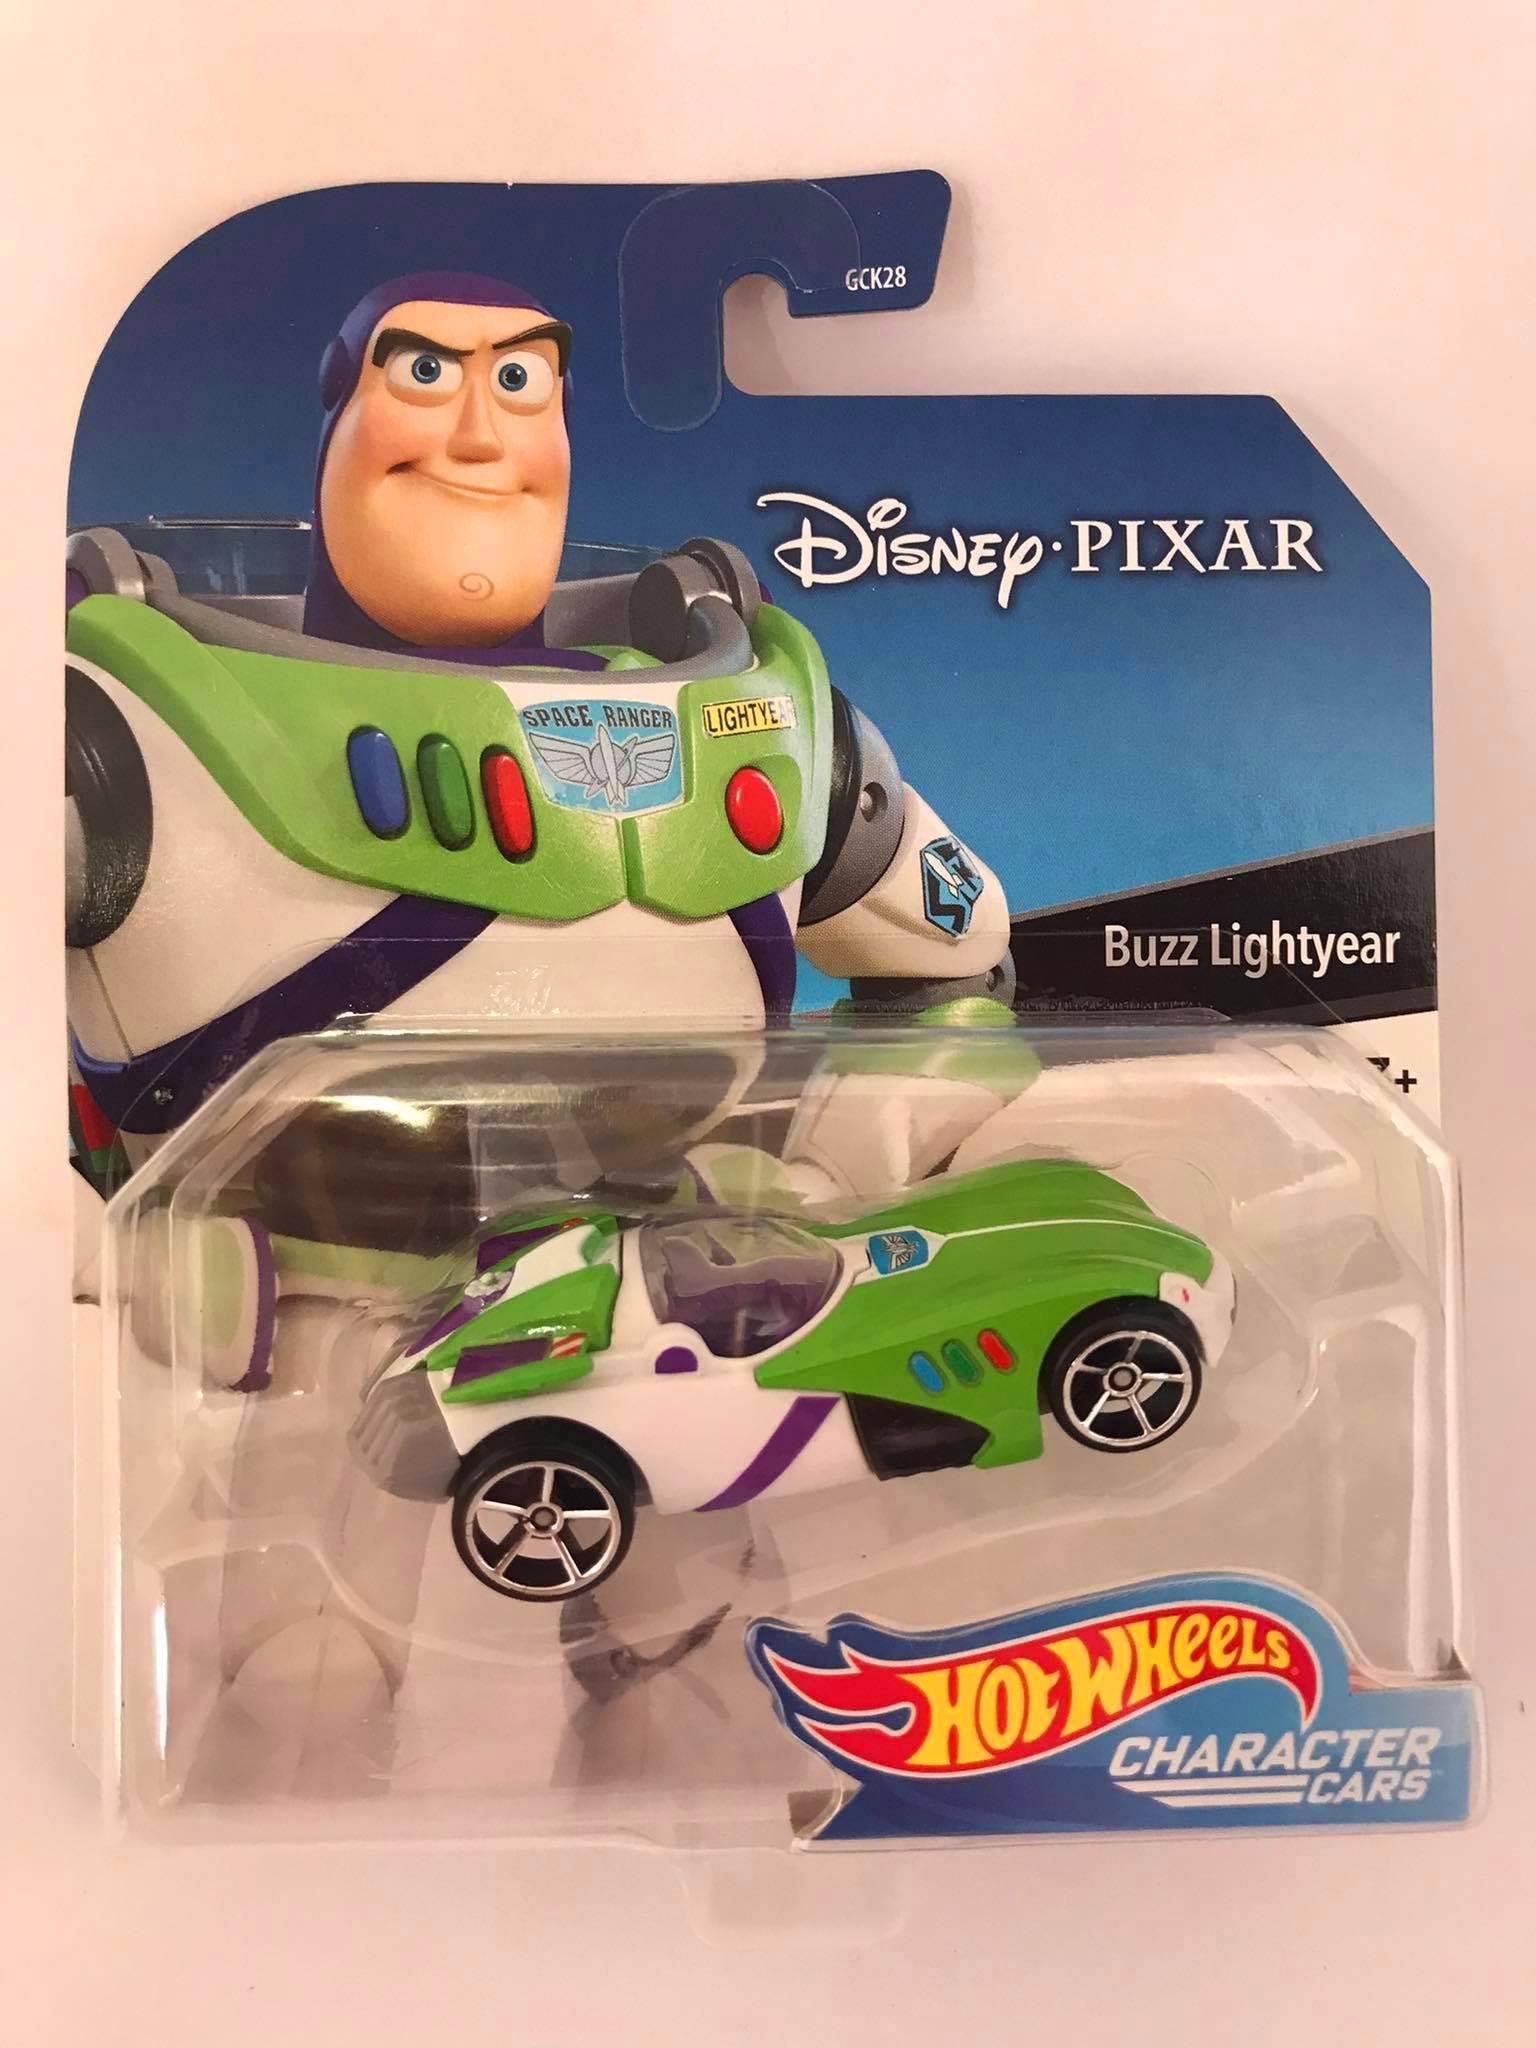 Hot Wheels - Buzz Lightyear Branco/Verde - Disney Pixar - Character Cars